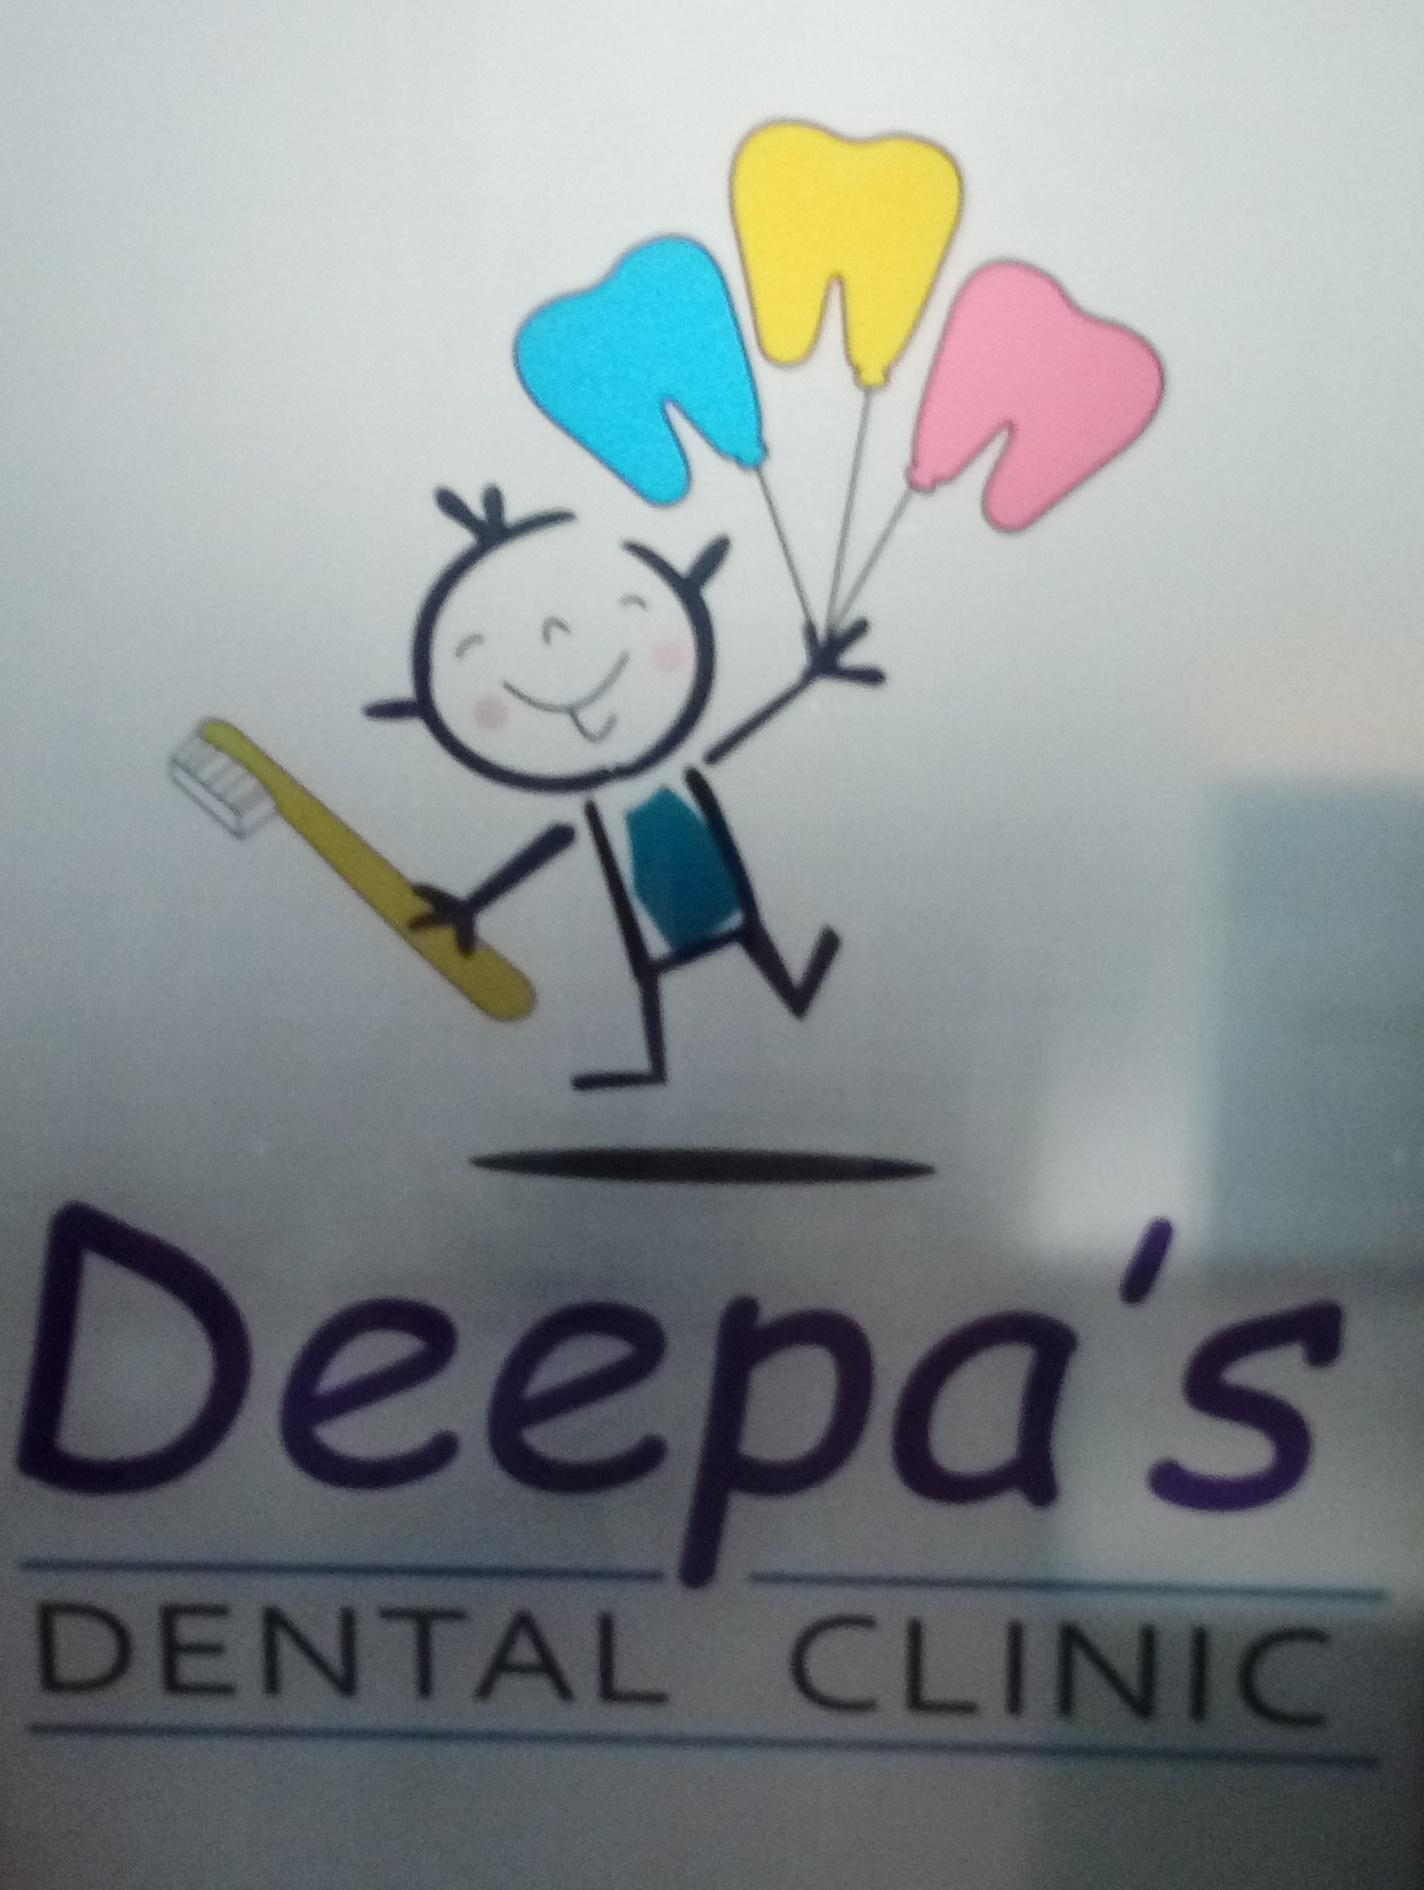 Deepa's Dental Clinic